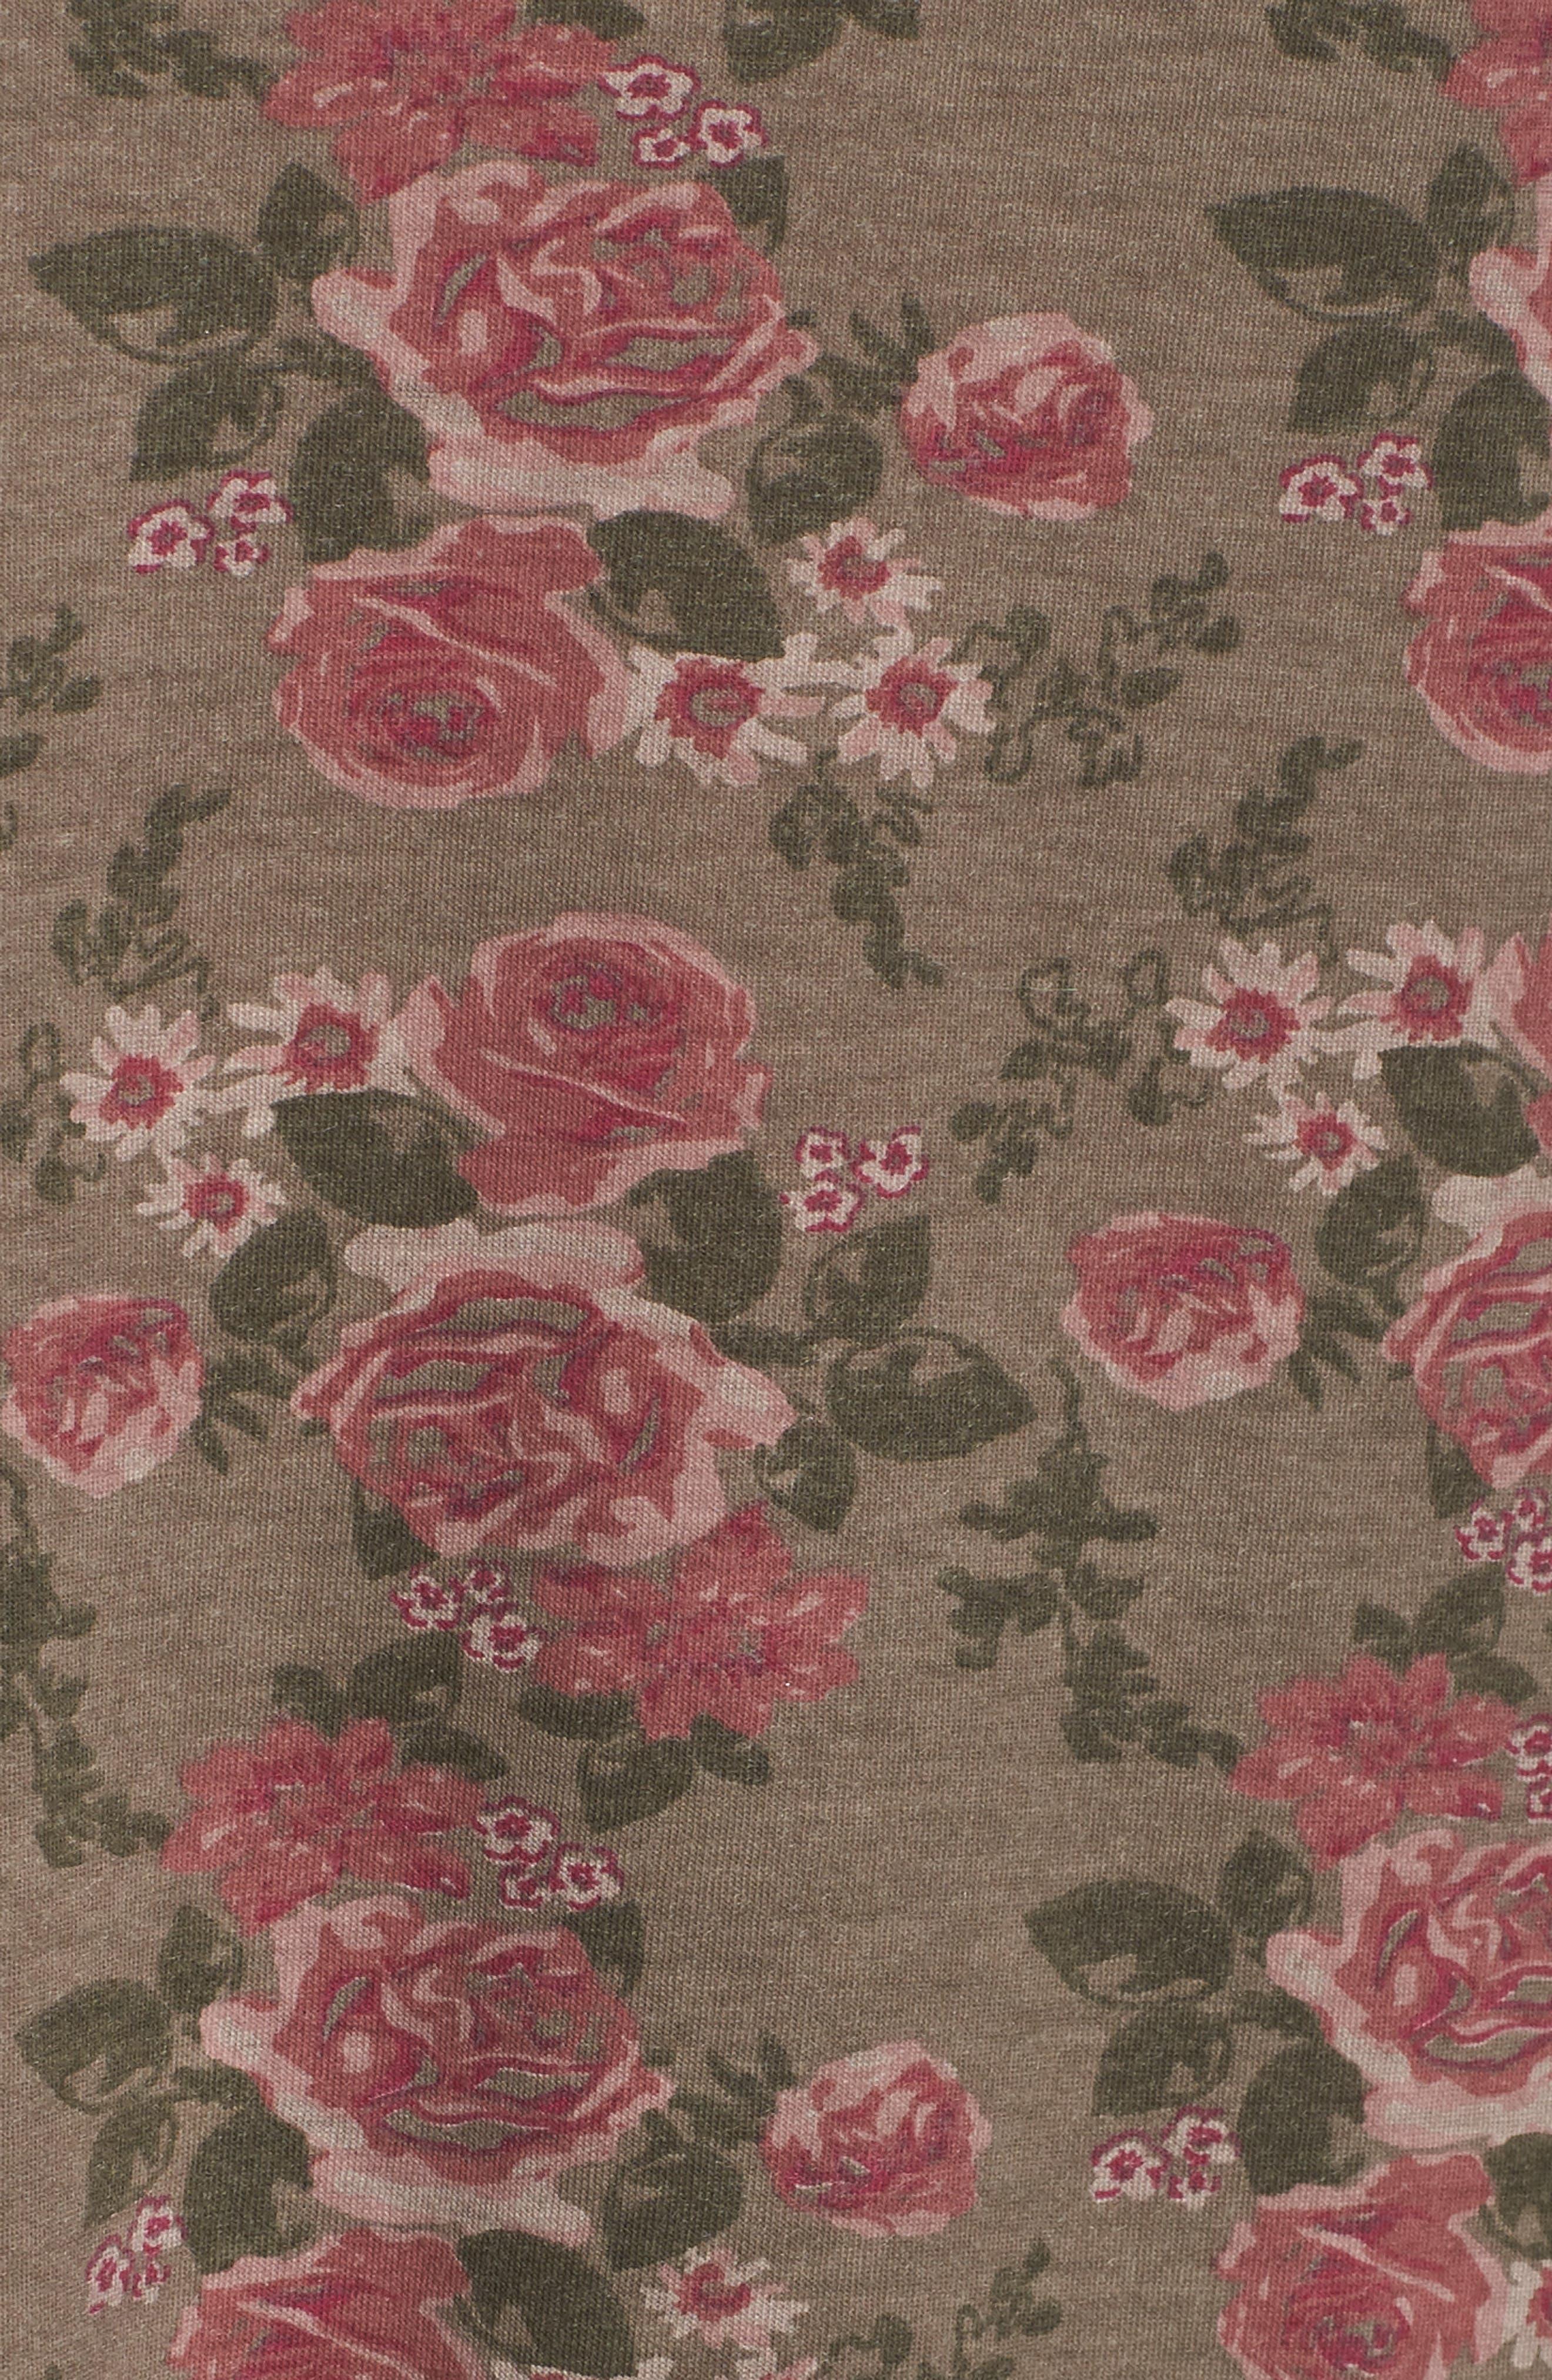 High/Low Oil Dye Floral Top,                             Alternate thumbnail 6, color,                             Moonrock